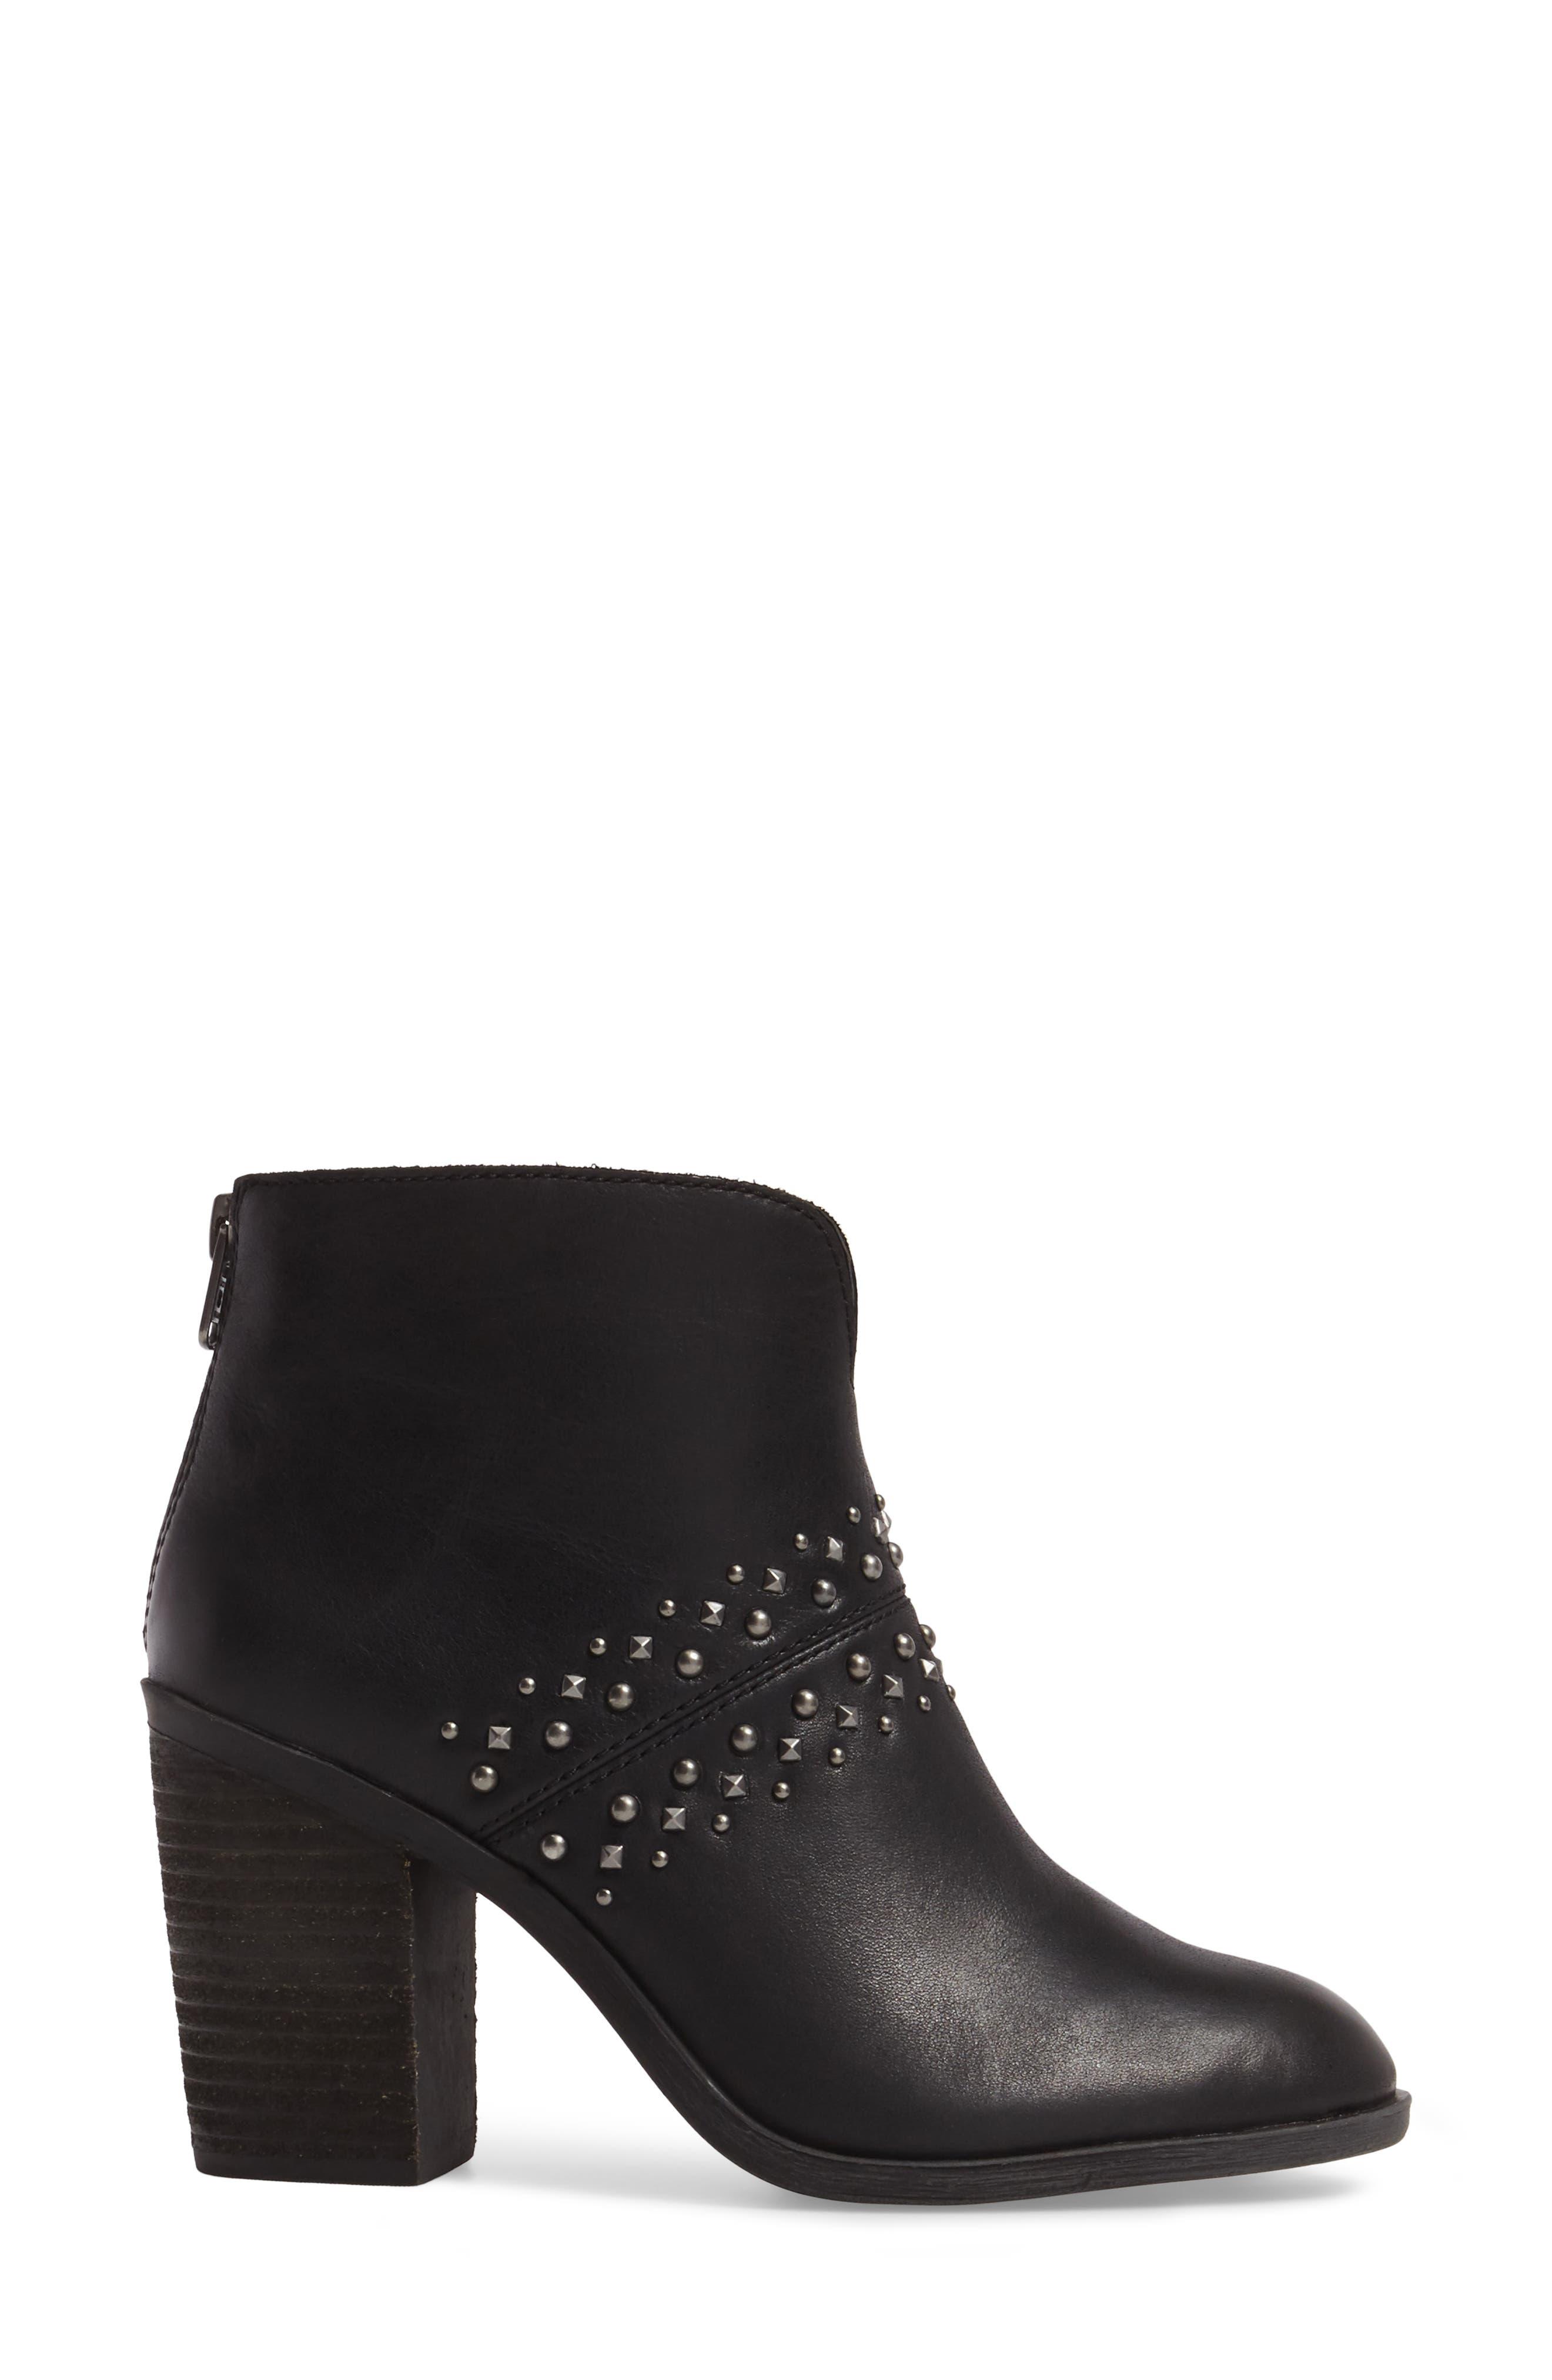 Sancha Studded Bootie,                             Alternate thumbnail 3, color,                             Black Leather